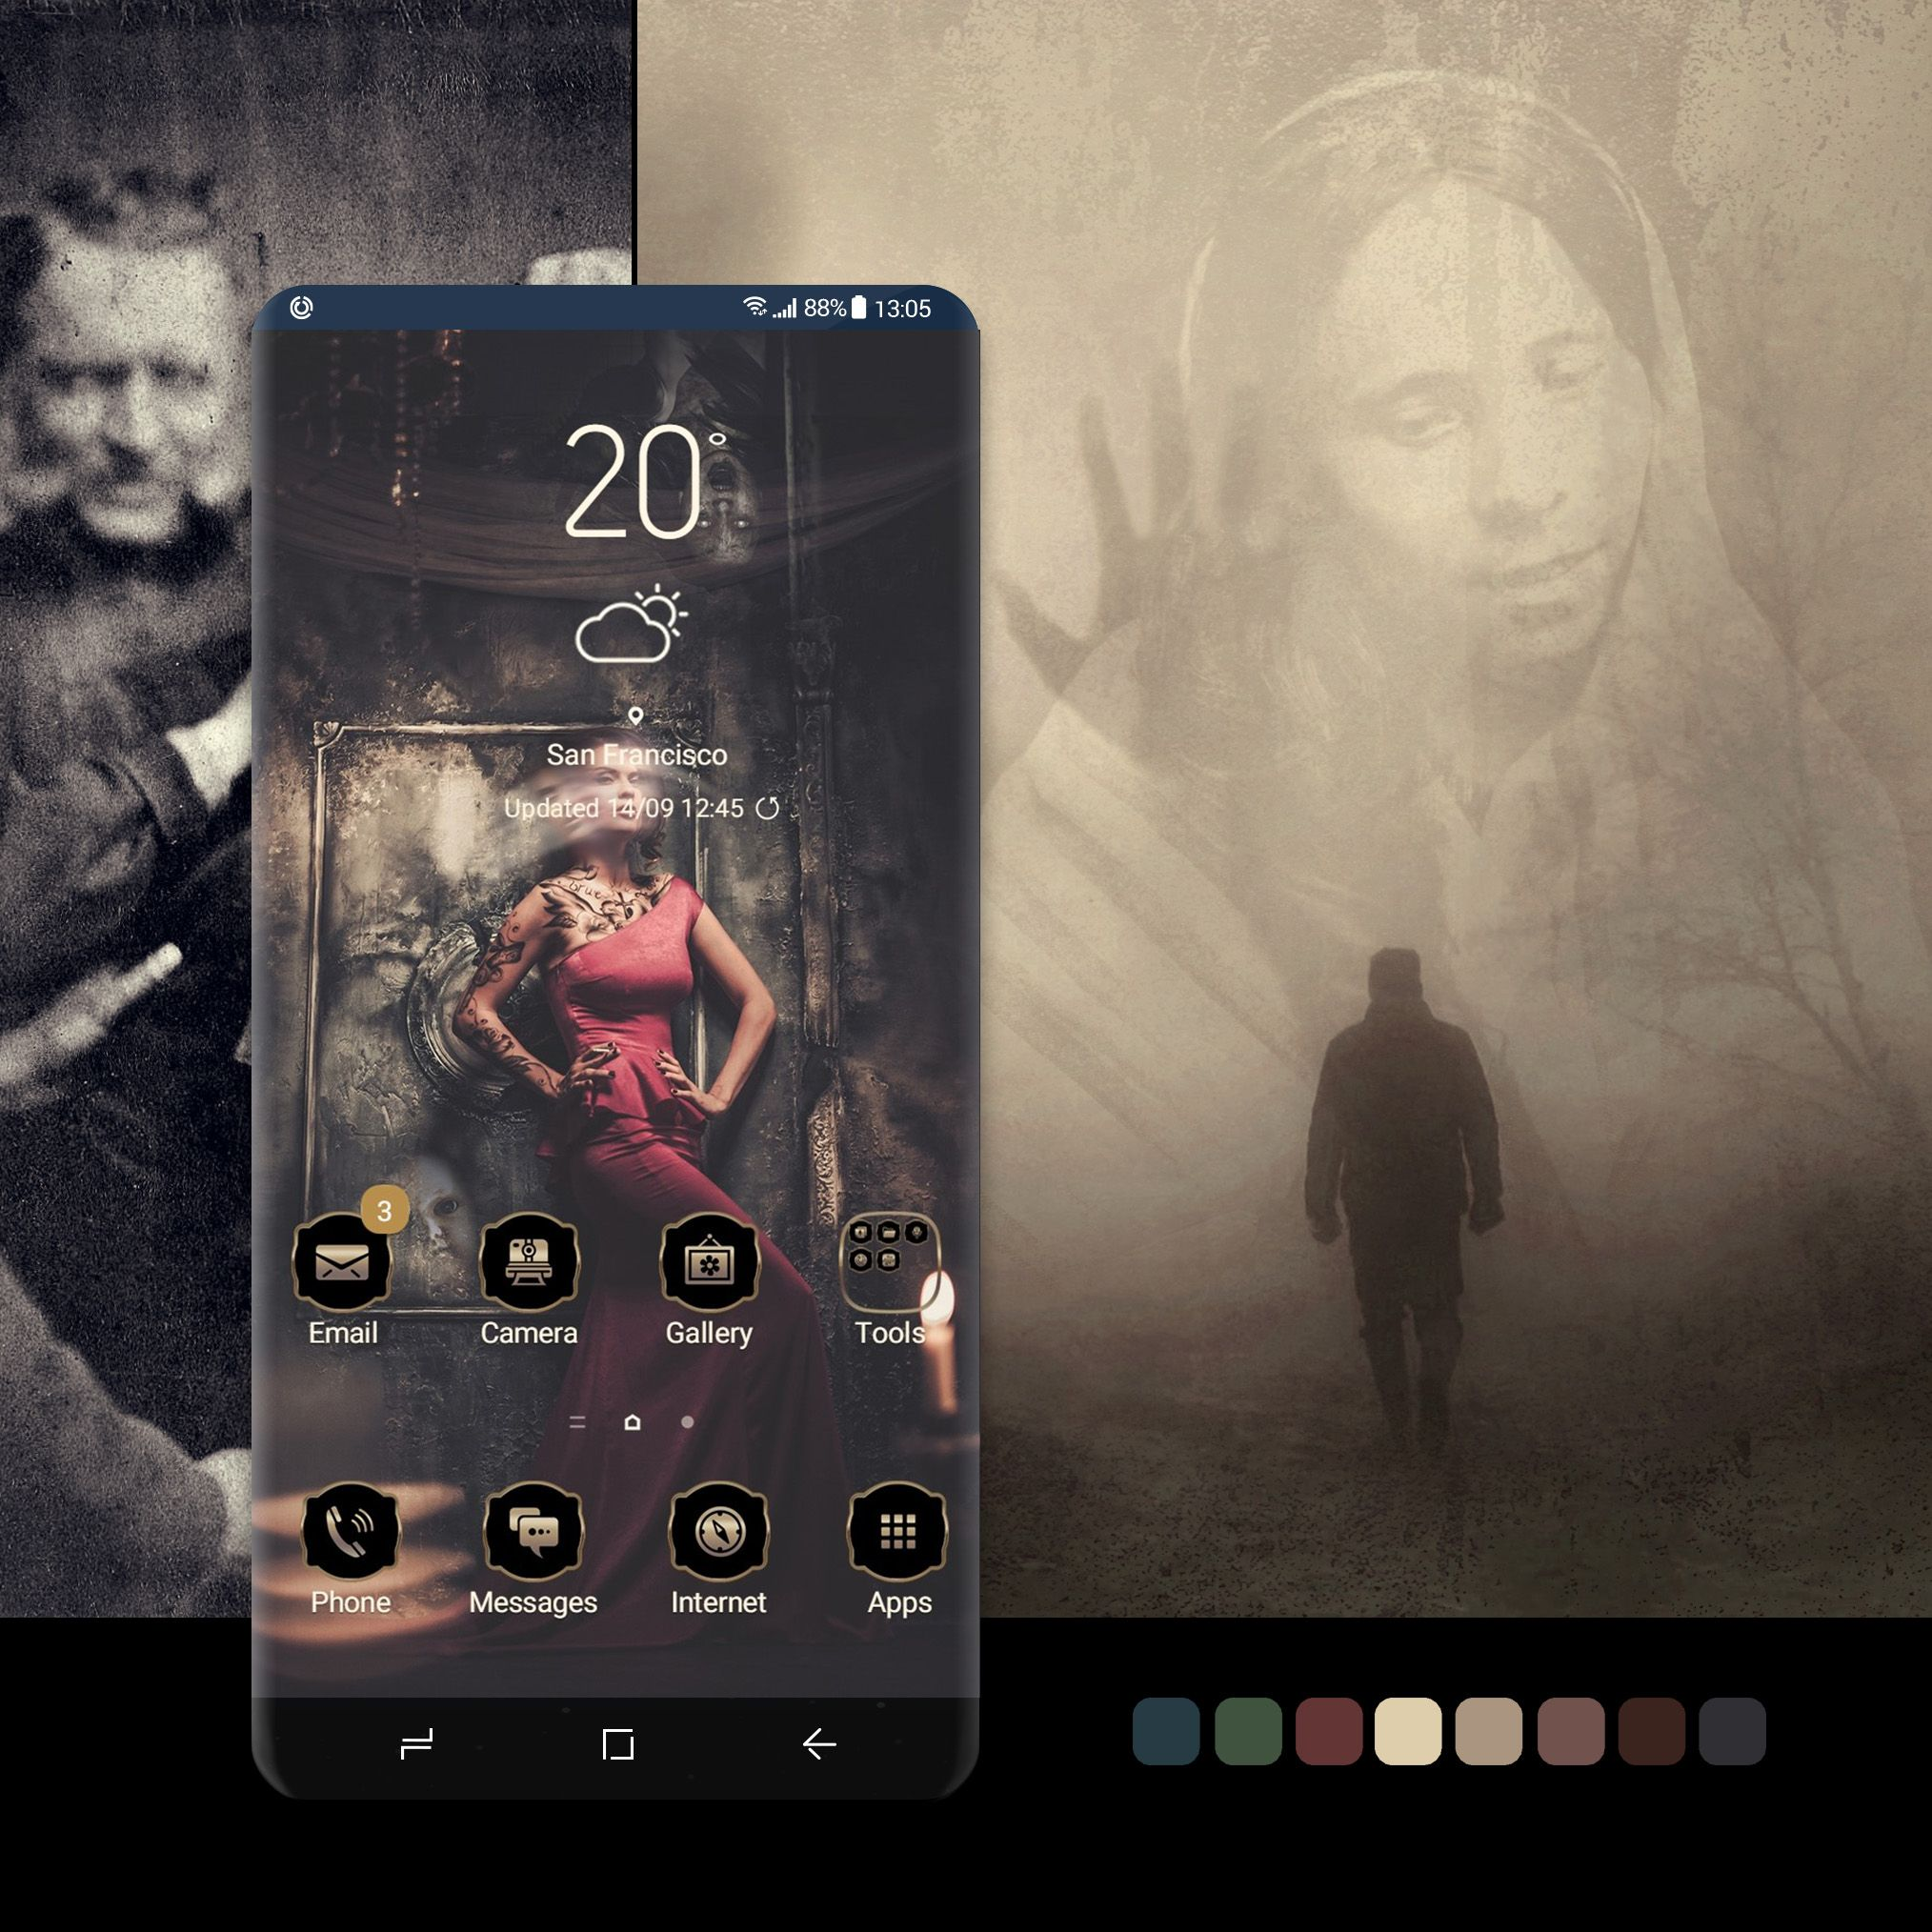 Delirium theme wallpaper, android, phone, smartphone